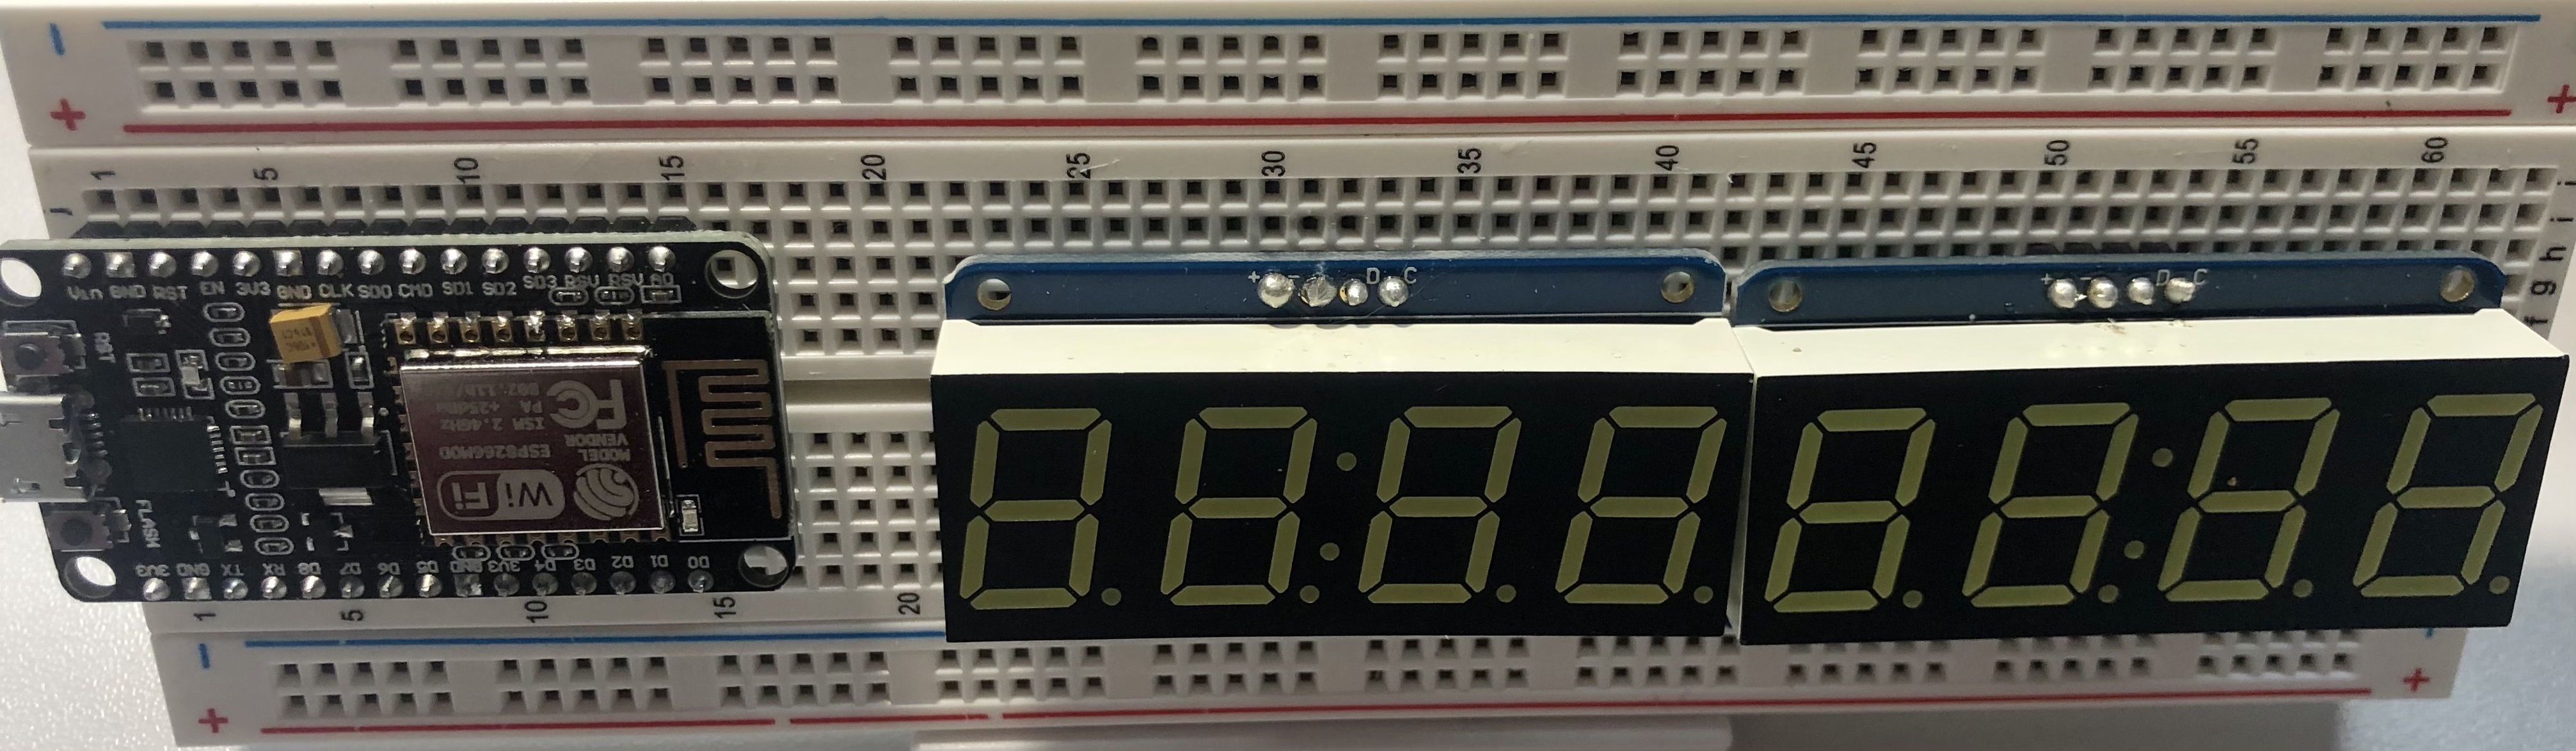 Place NodeMCU and two 7-segment displays in solderless breadboard